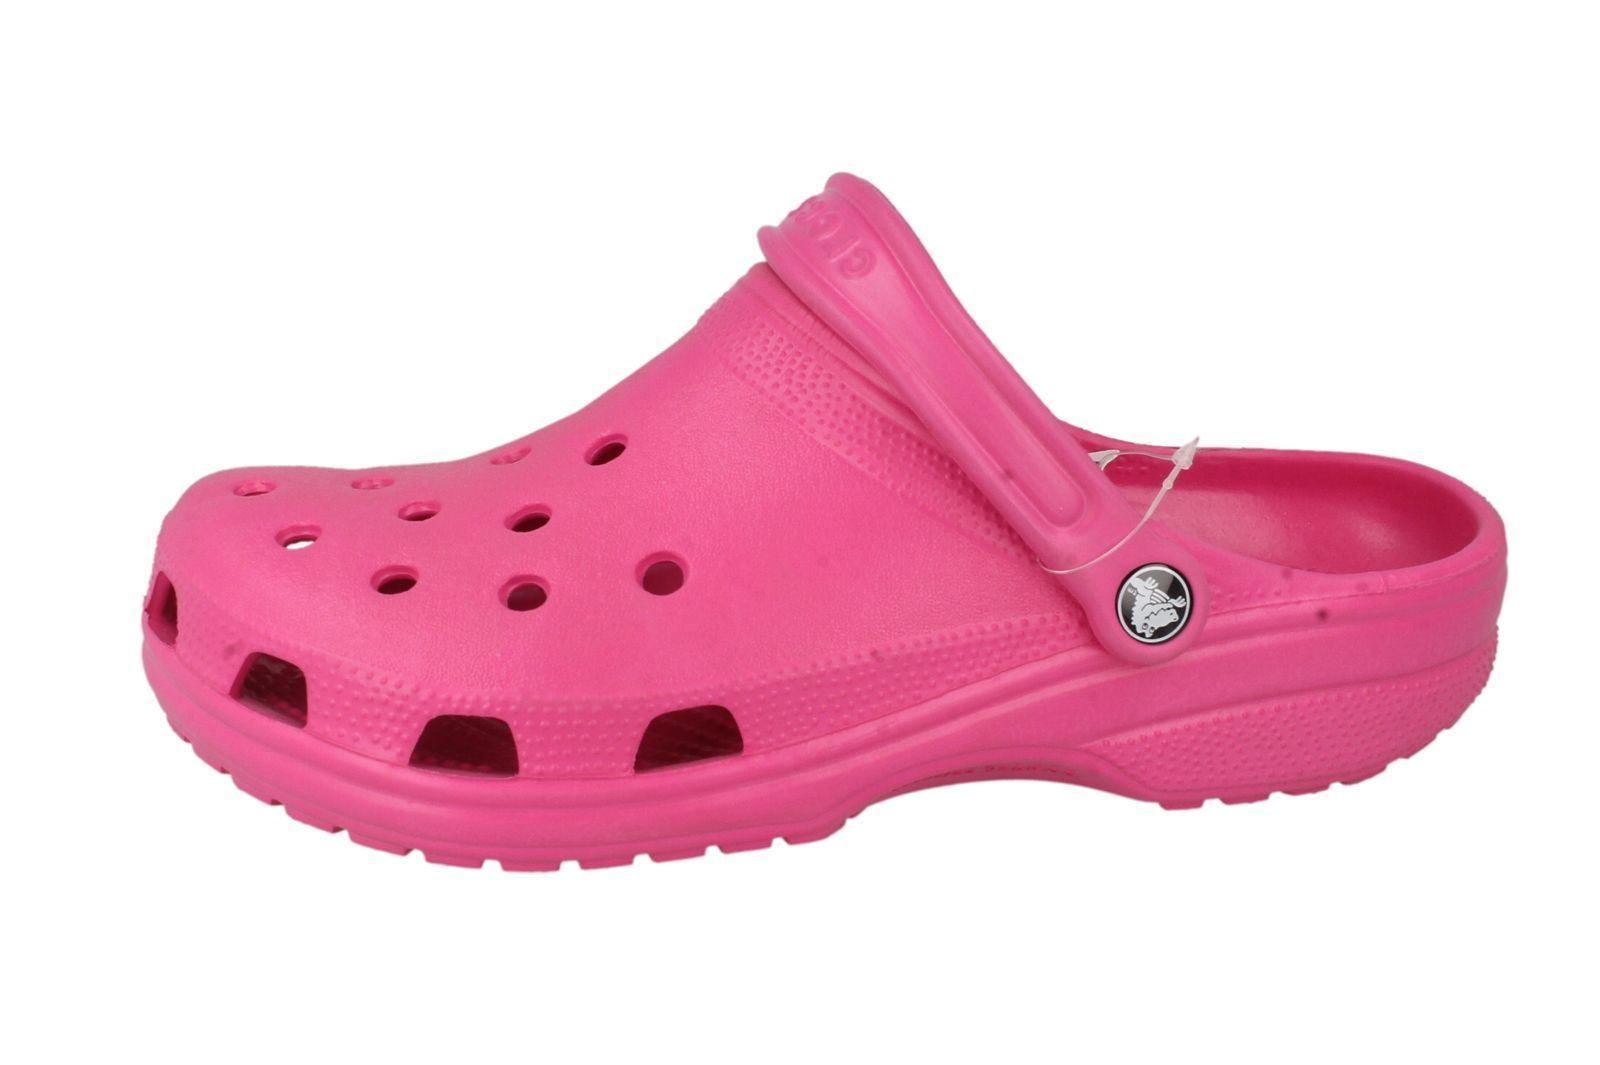 723cc1cc6af227 Adults Crocs Slip On Casual Clogs  Cayman  Label ~ K